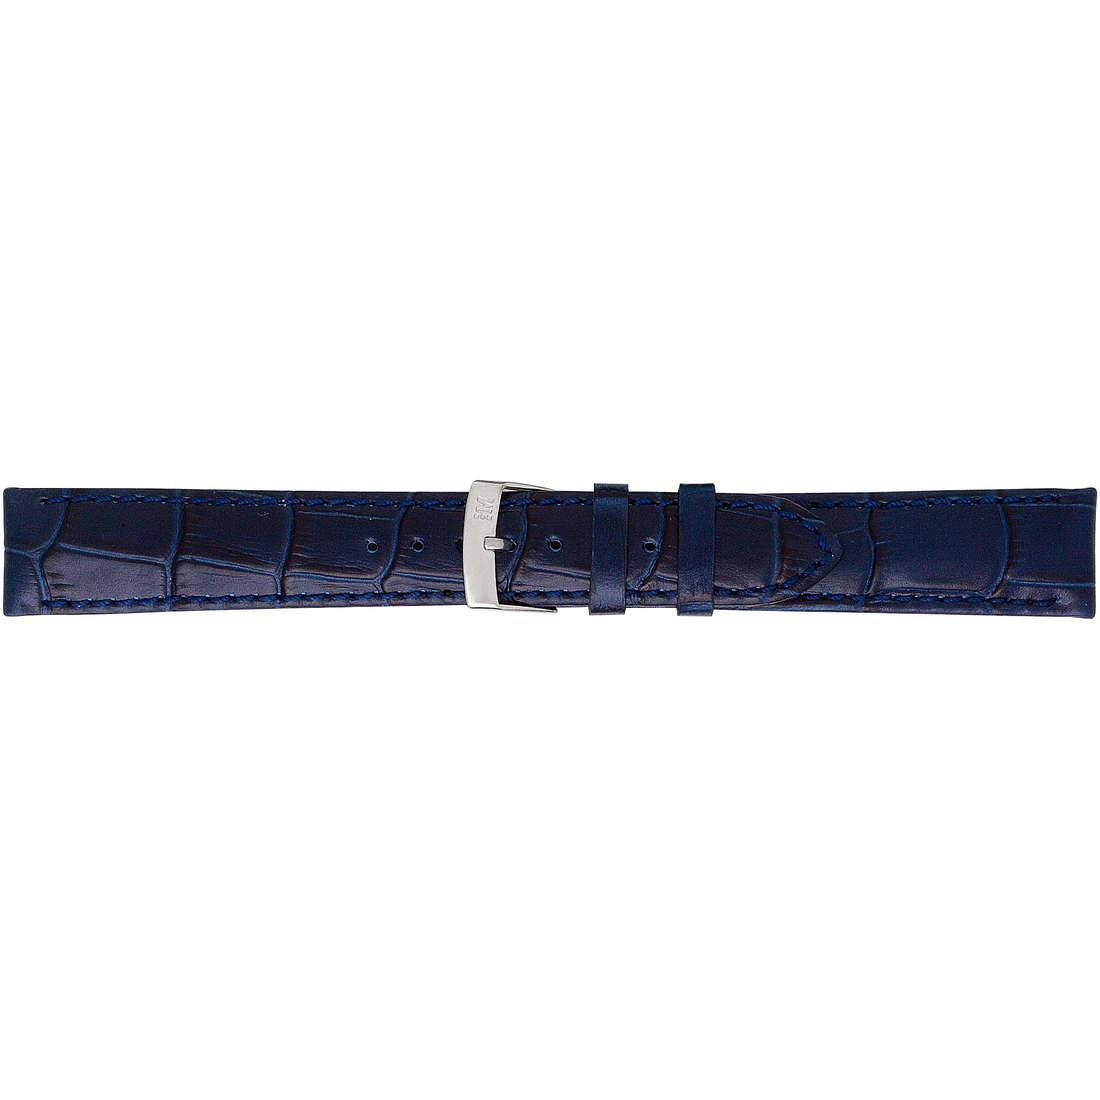 watch watch bands watch straps man Morellato Performance A01X2704656062CR14